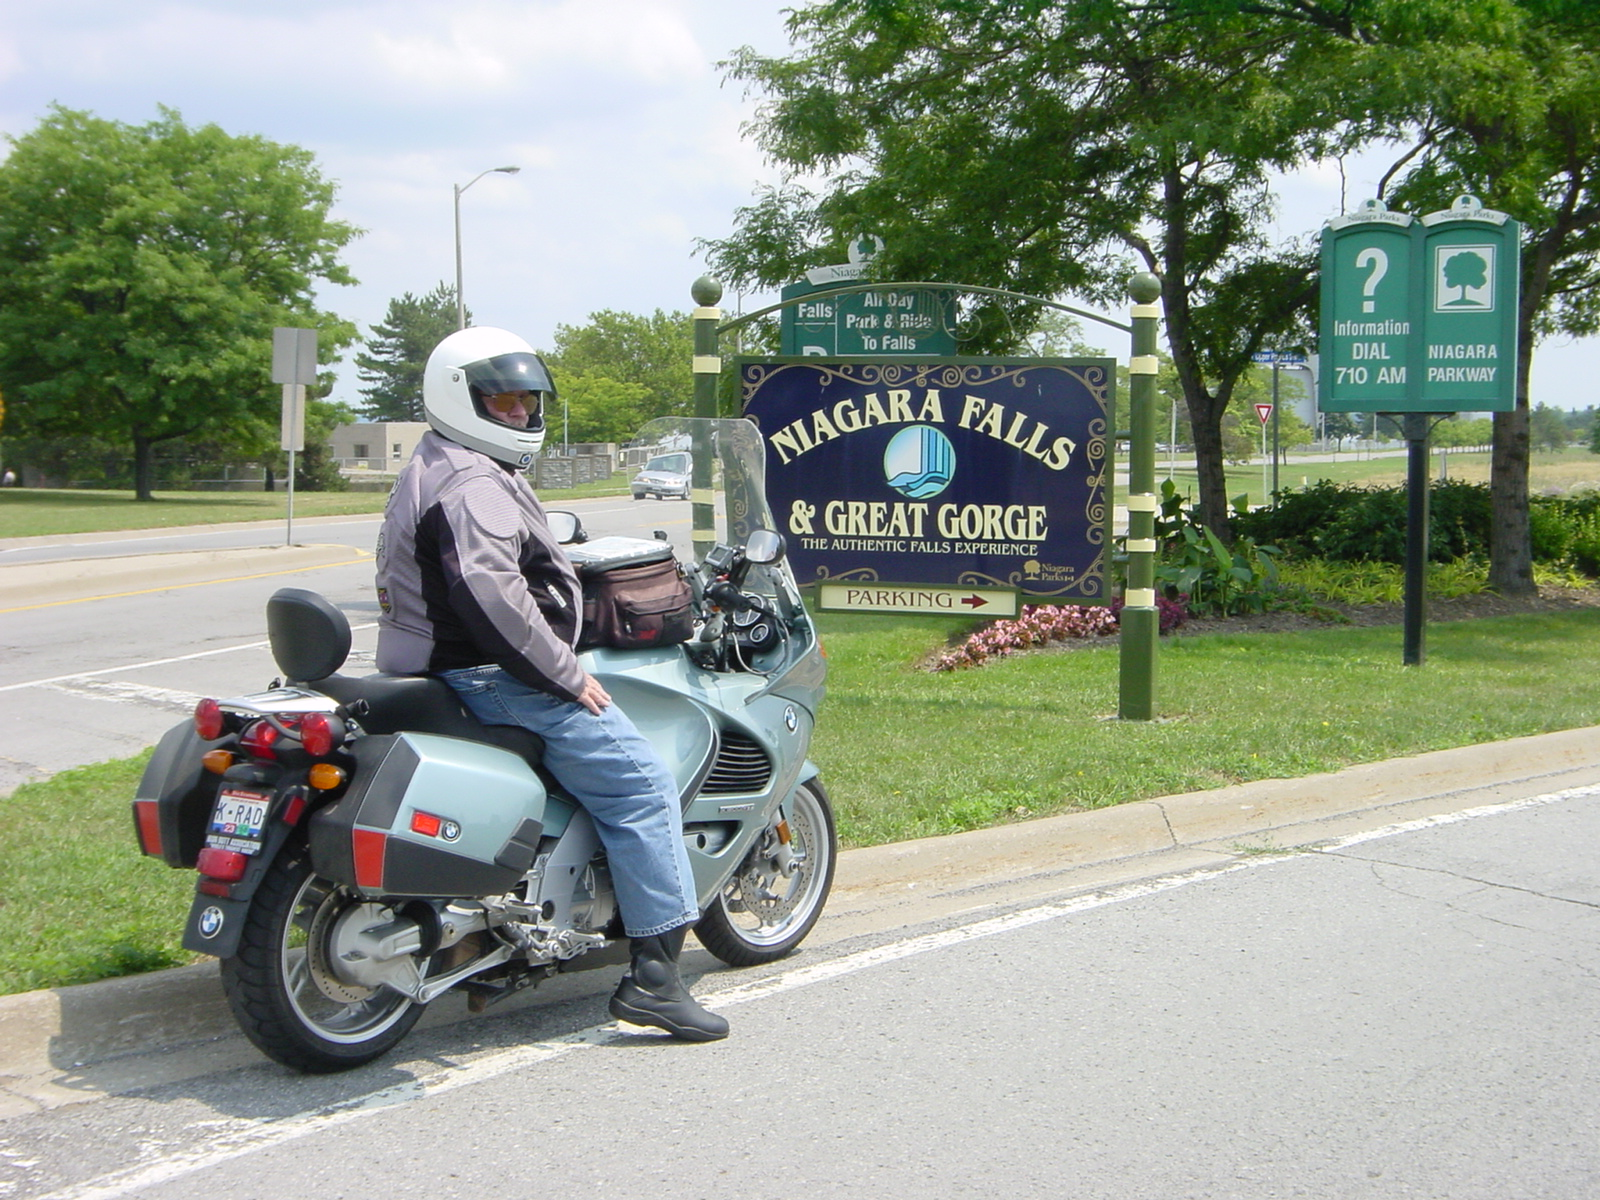 16a56614834d The Brummett's Interests - Motorcycles